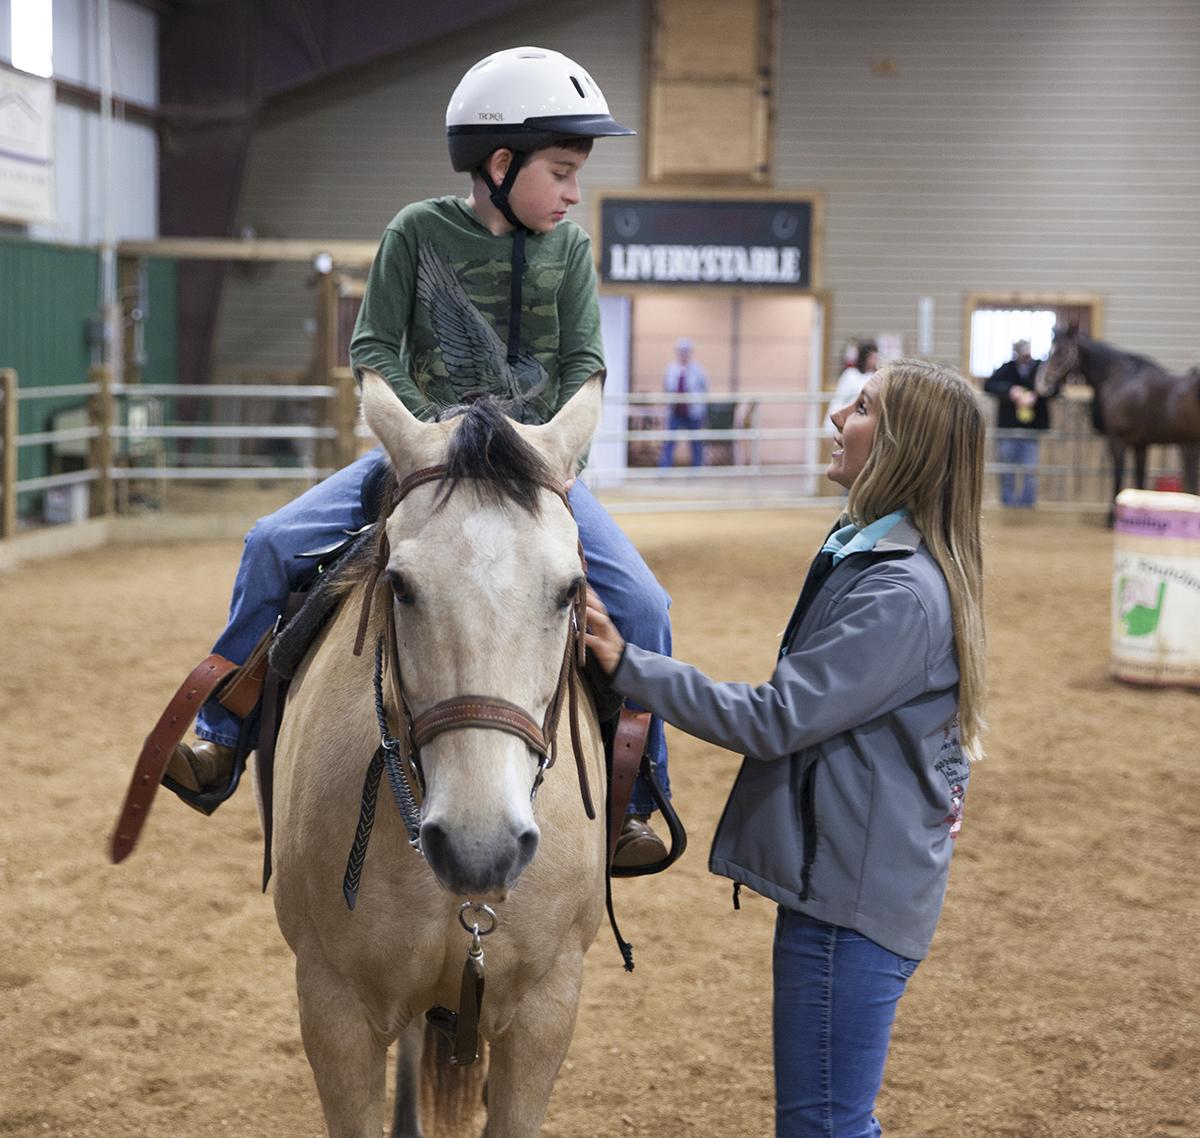 Senior arena instructor Loryn Barclay helps Karson Robb ride his horse.